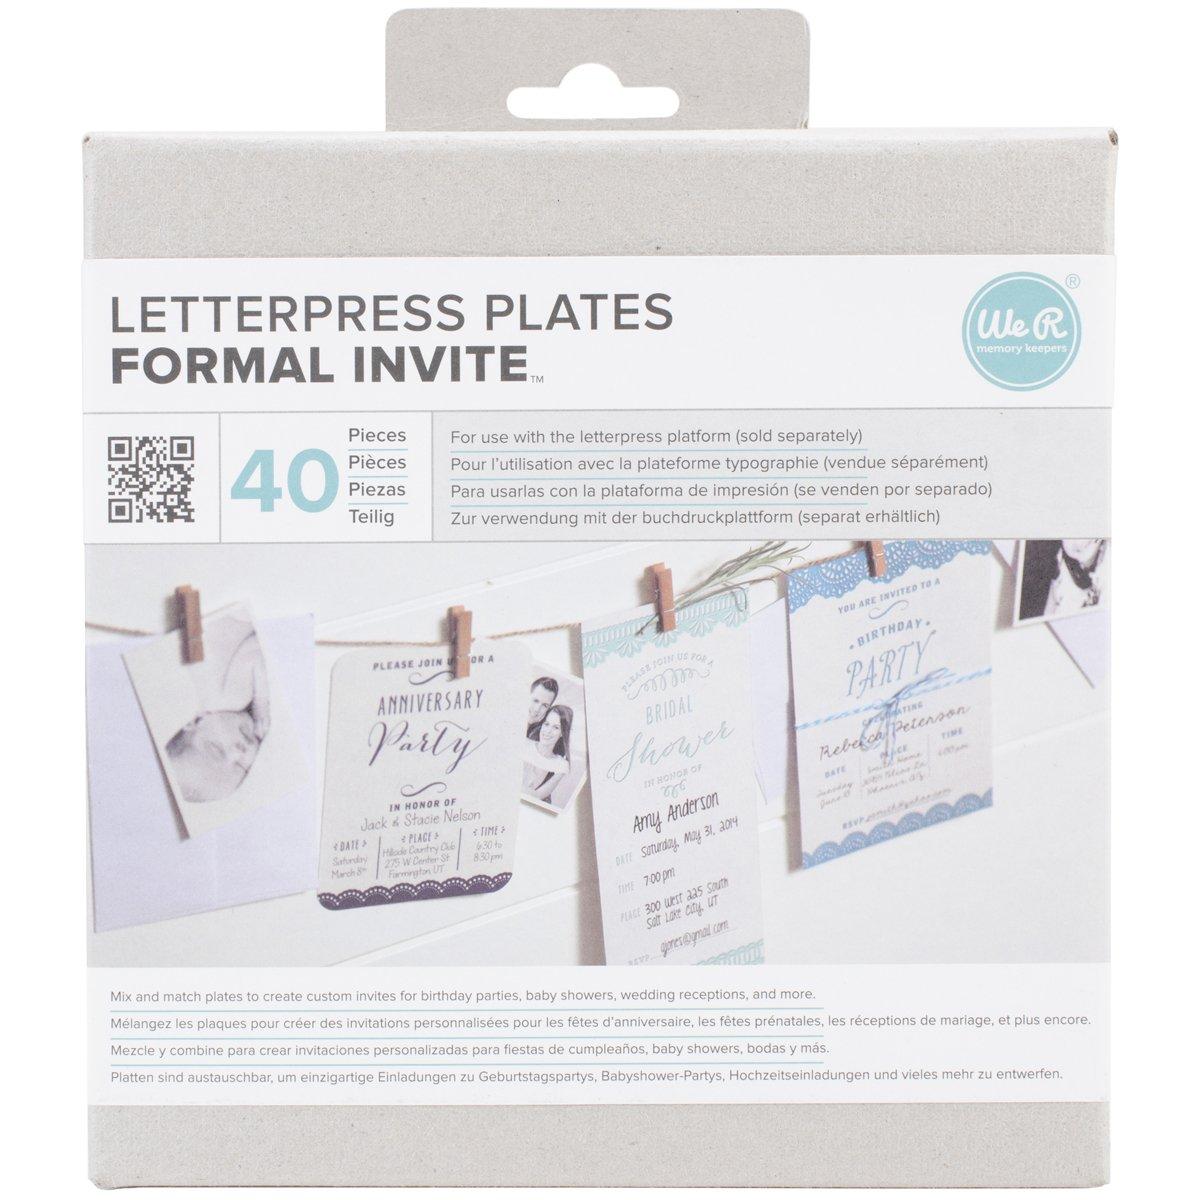 Amazon com we r memory keepers llpp 3752 lifestyle letterpress plates formal invite